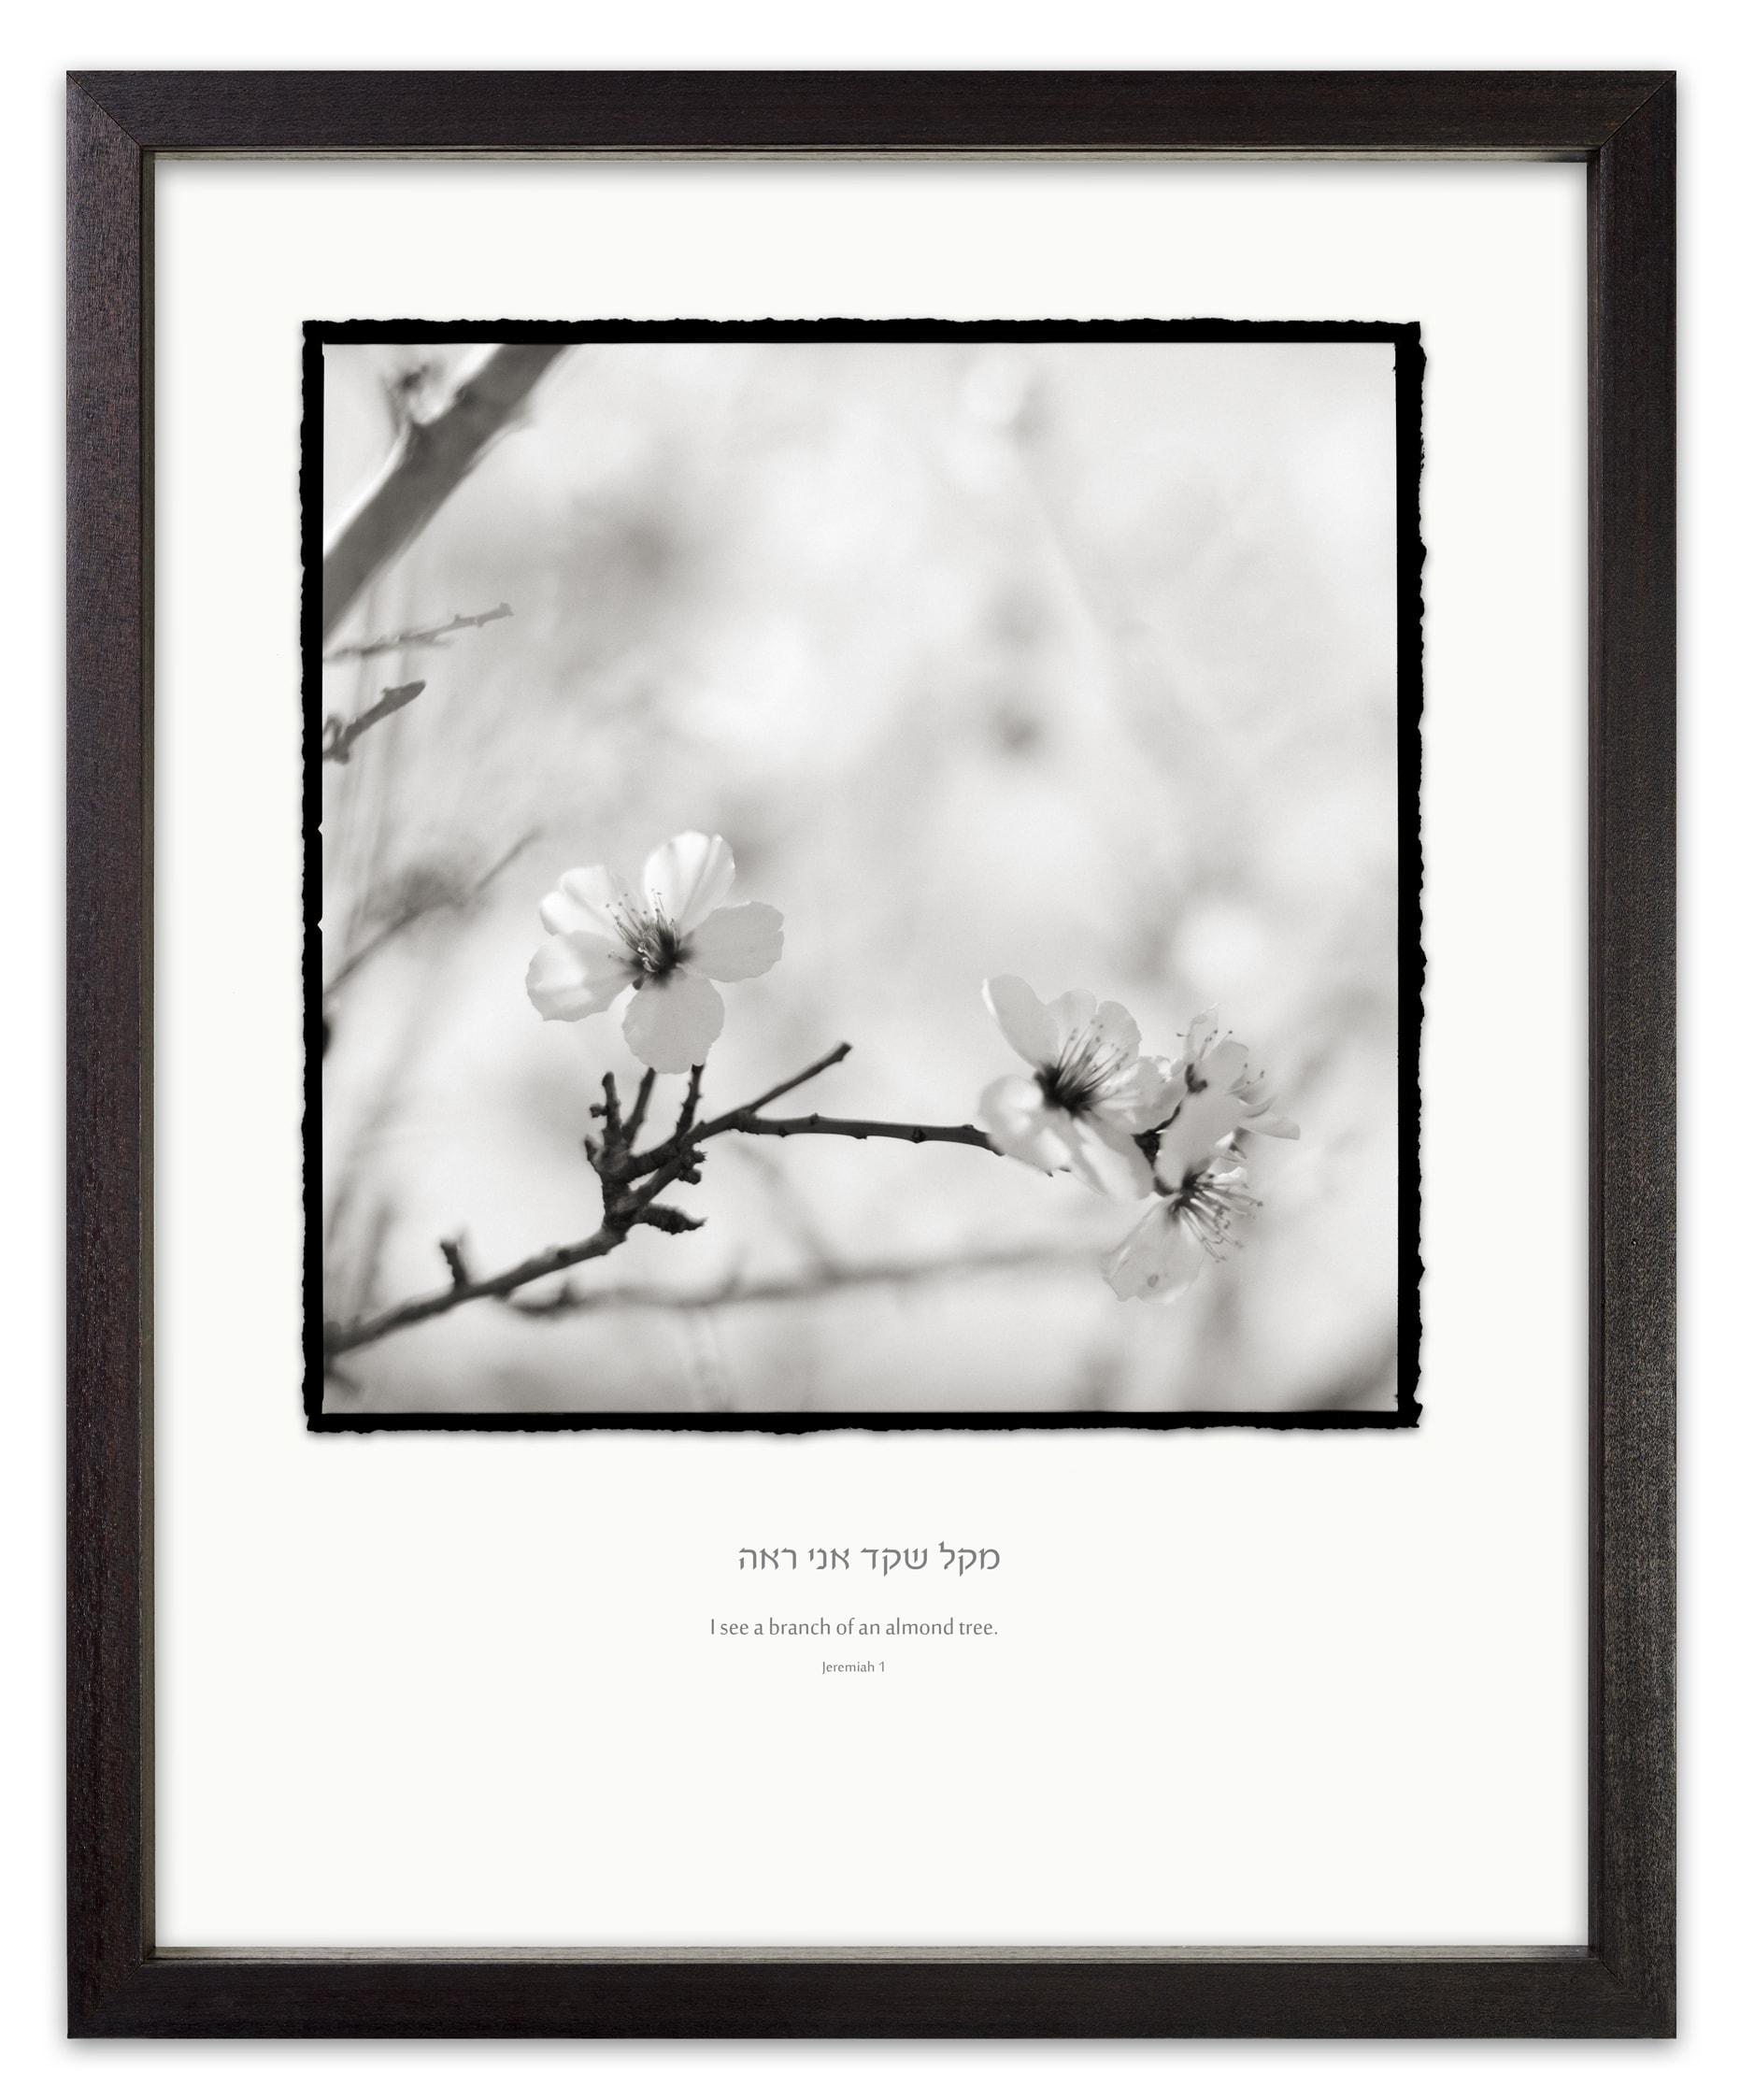 Almond Blossom jeremaia